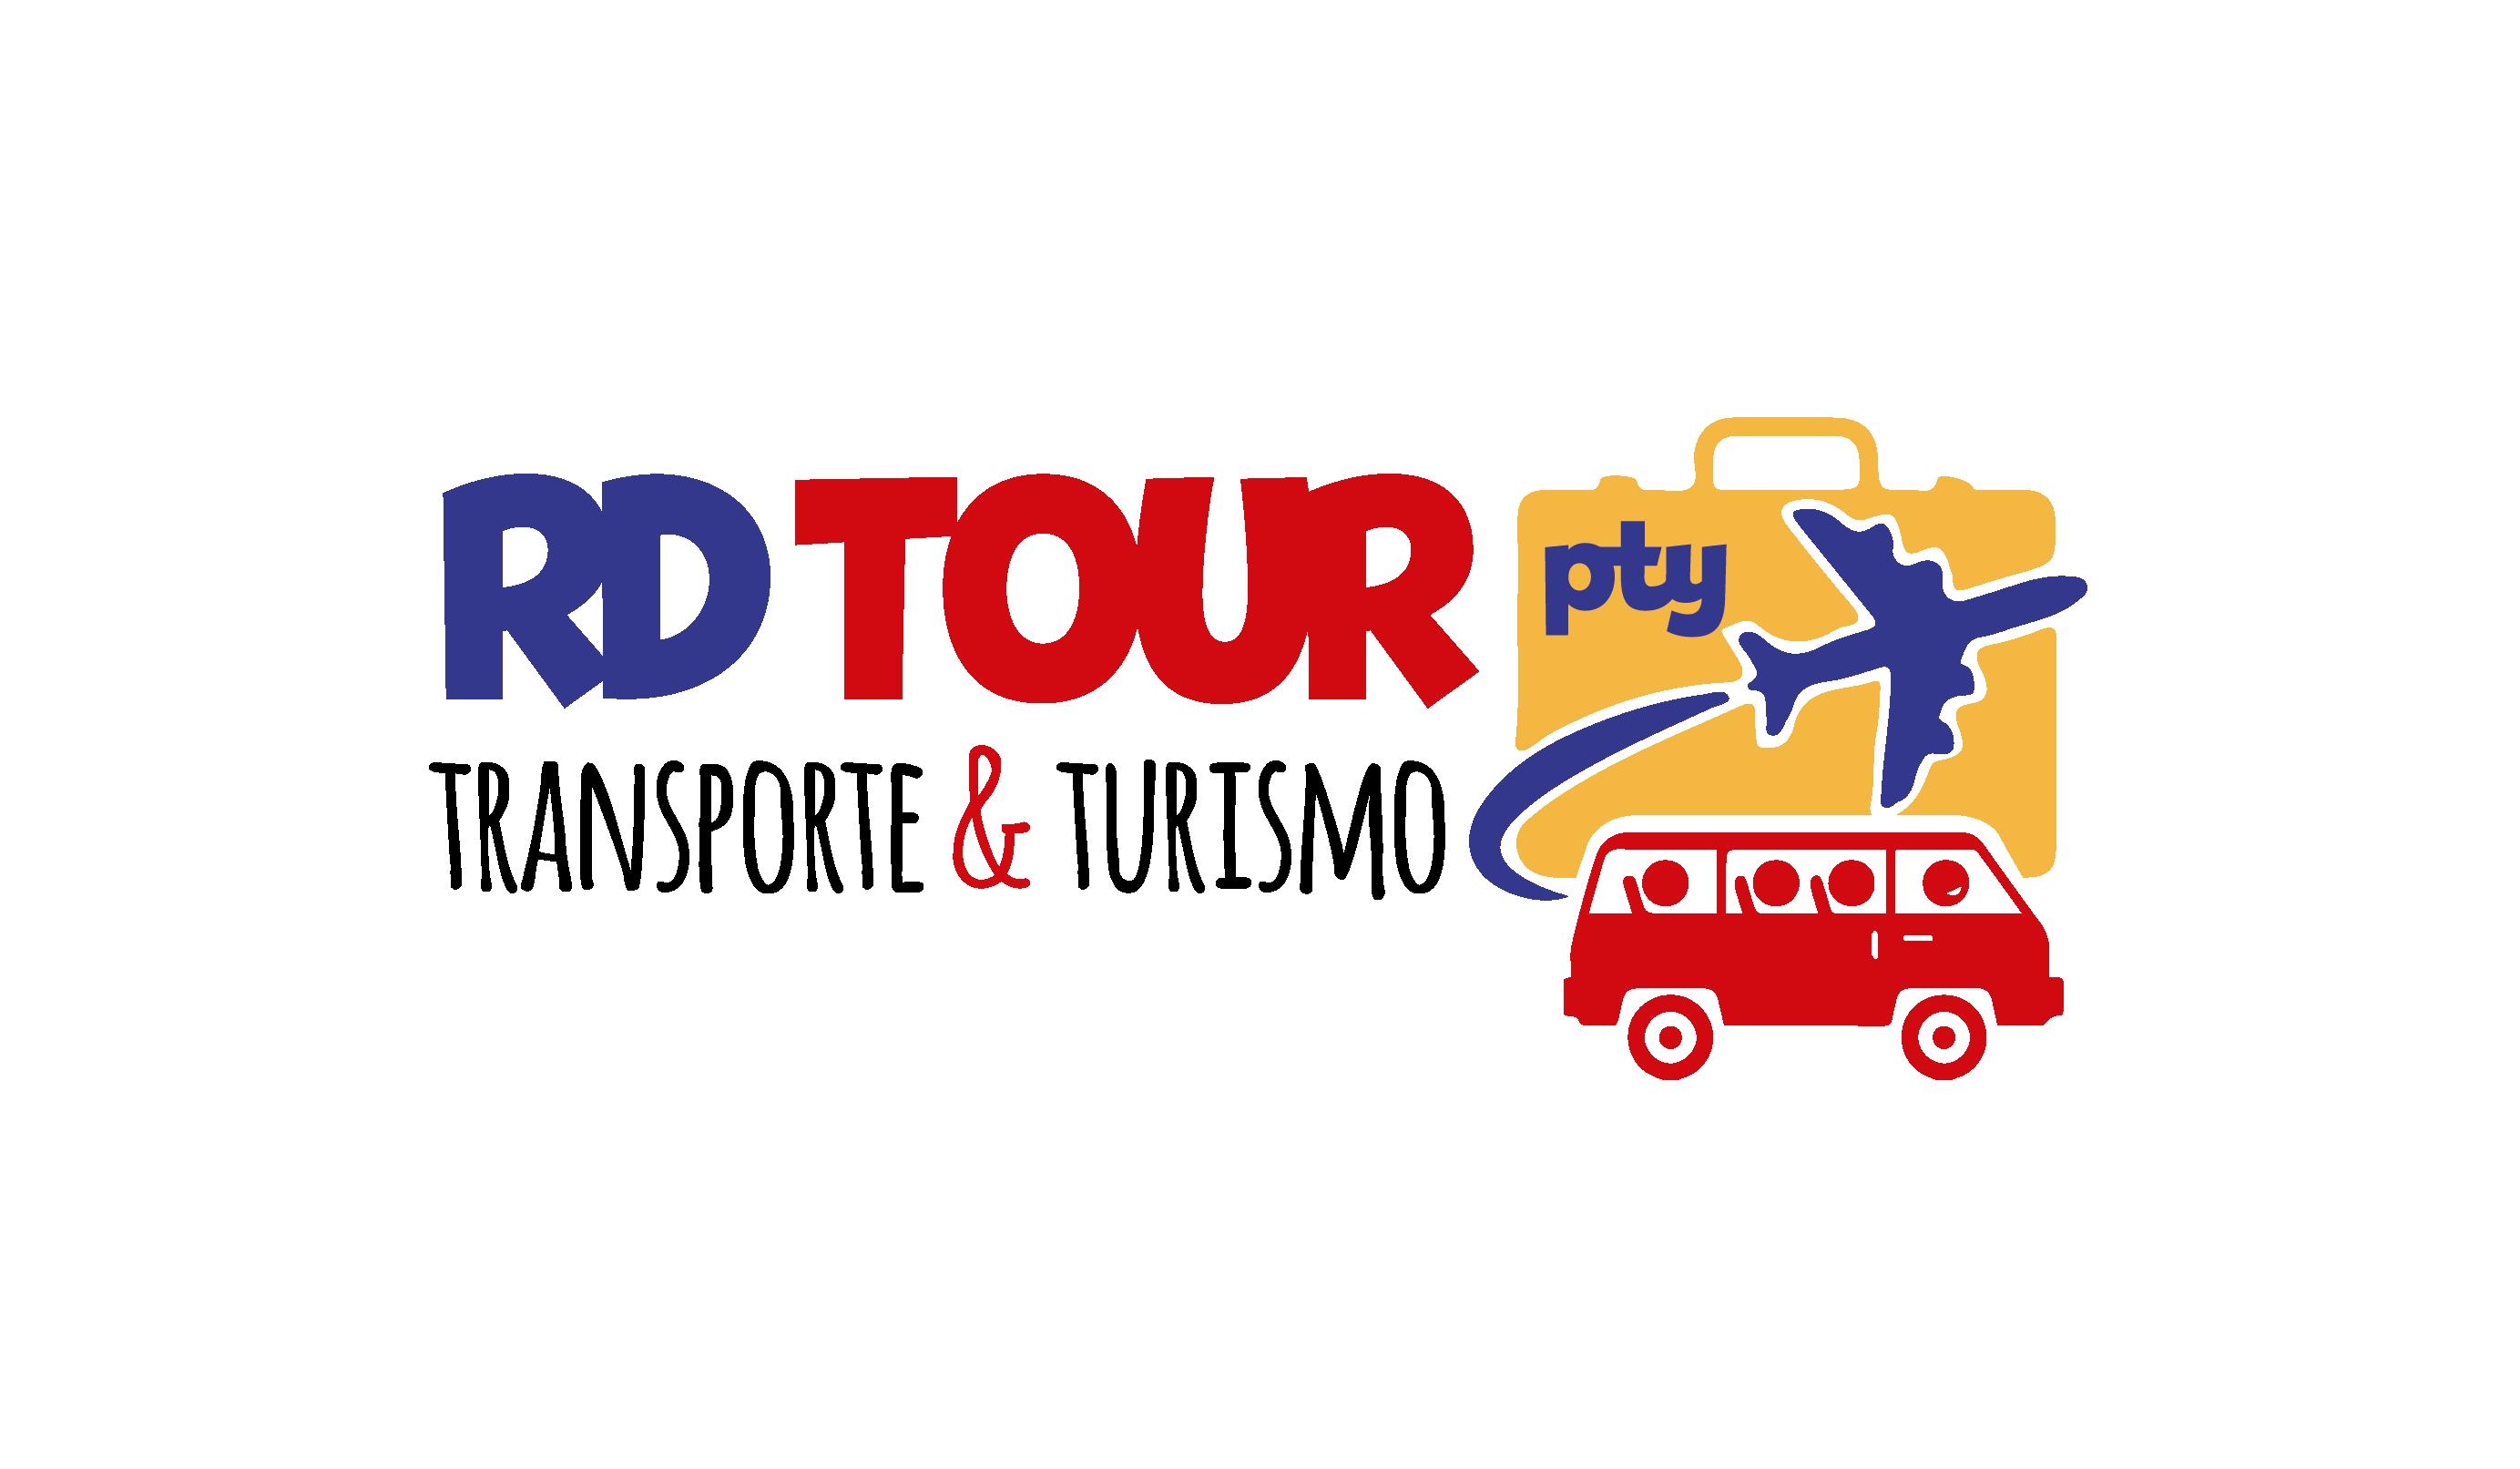 Rd tiur logo 01